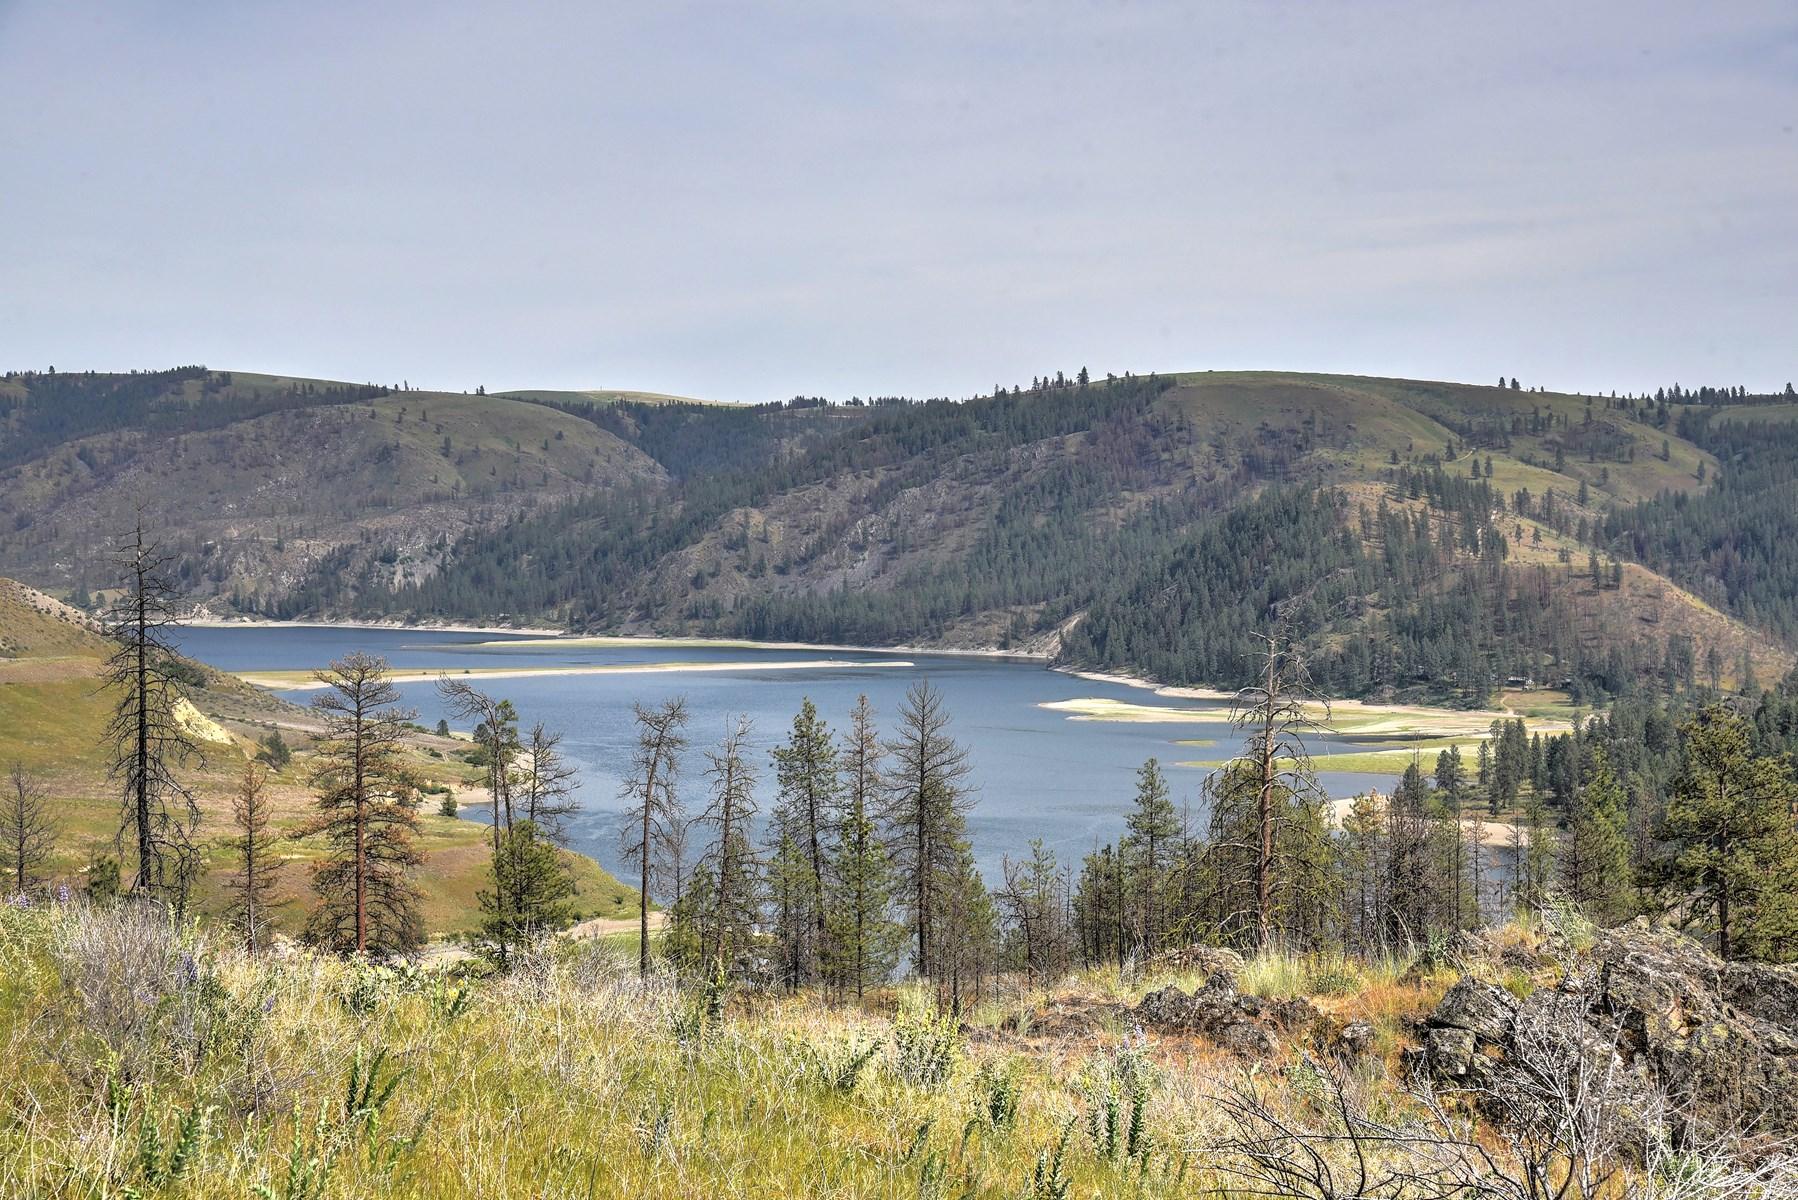 Hunting Property overlooking Lake Roosevelt, WA